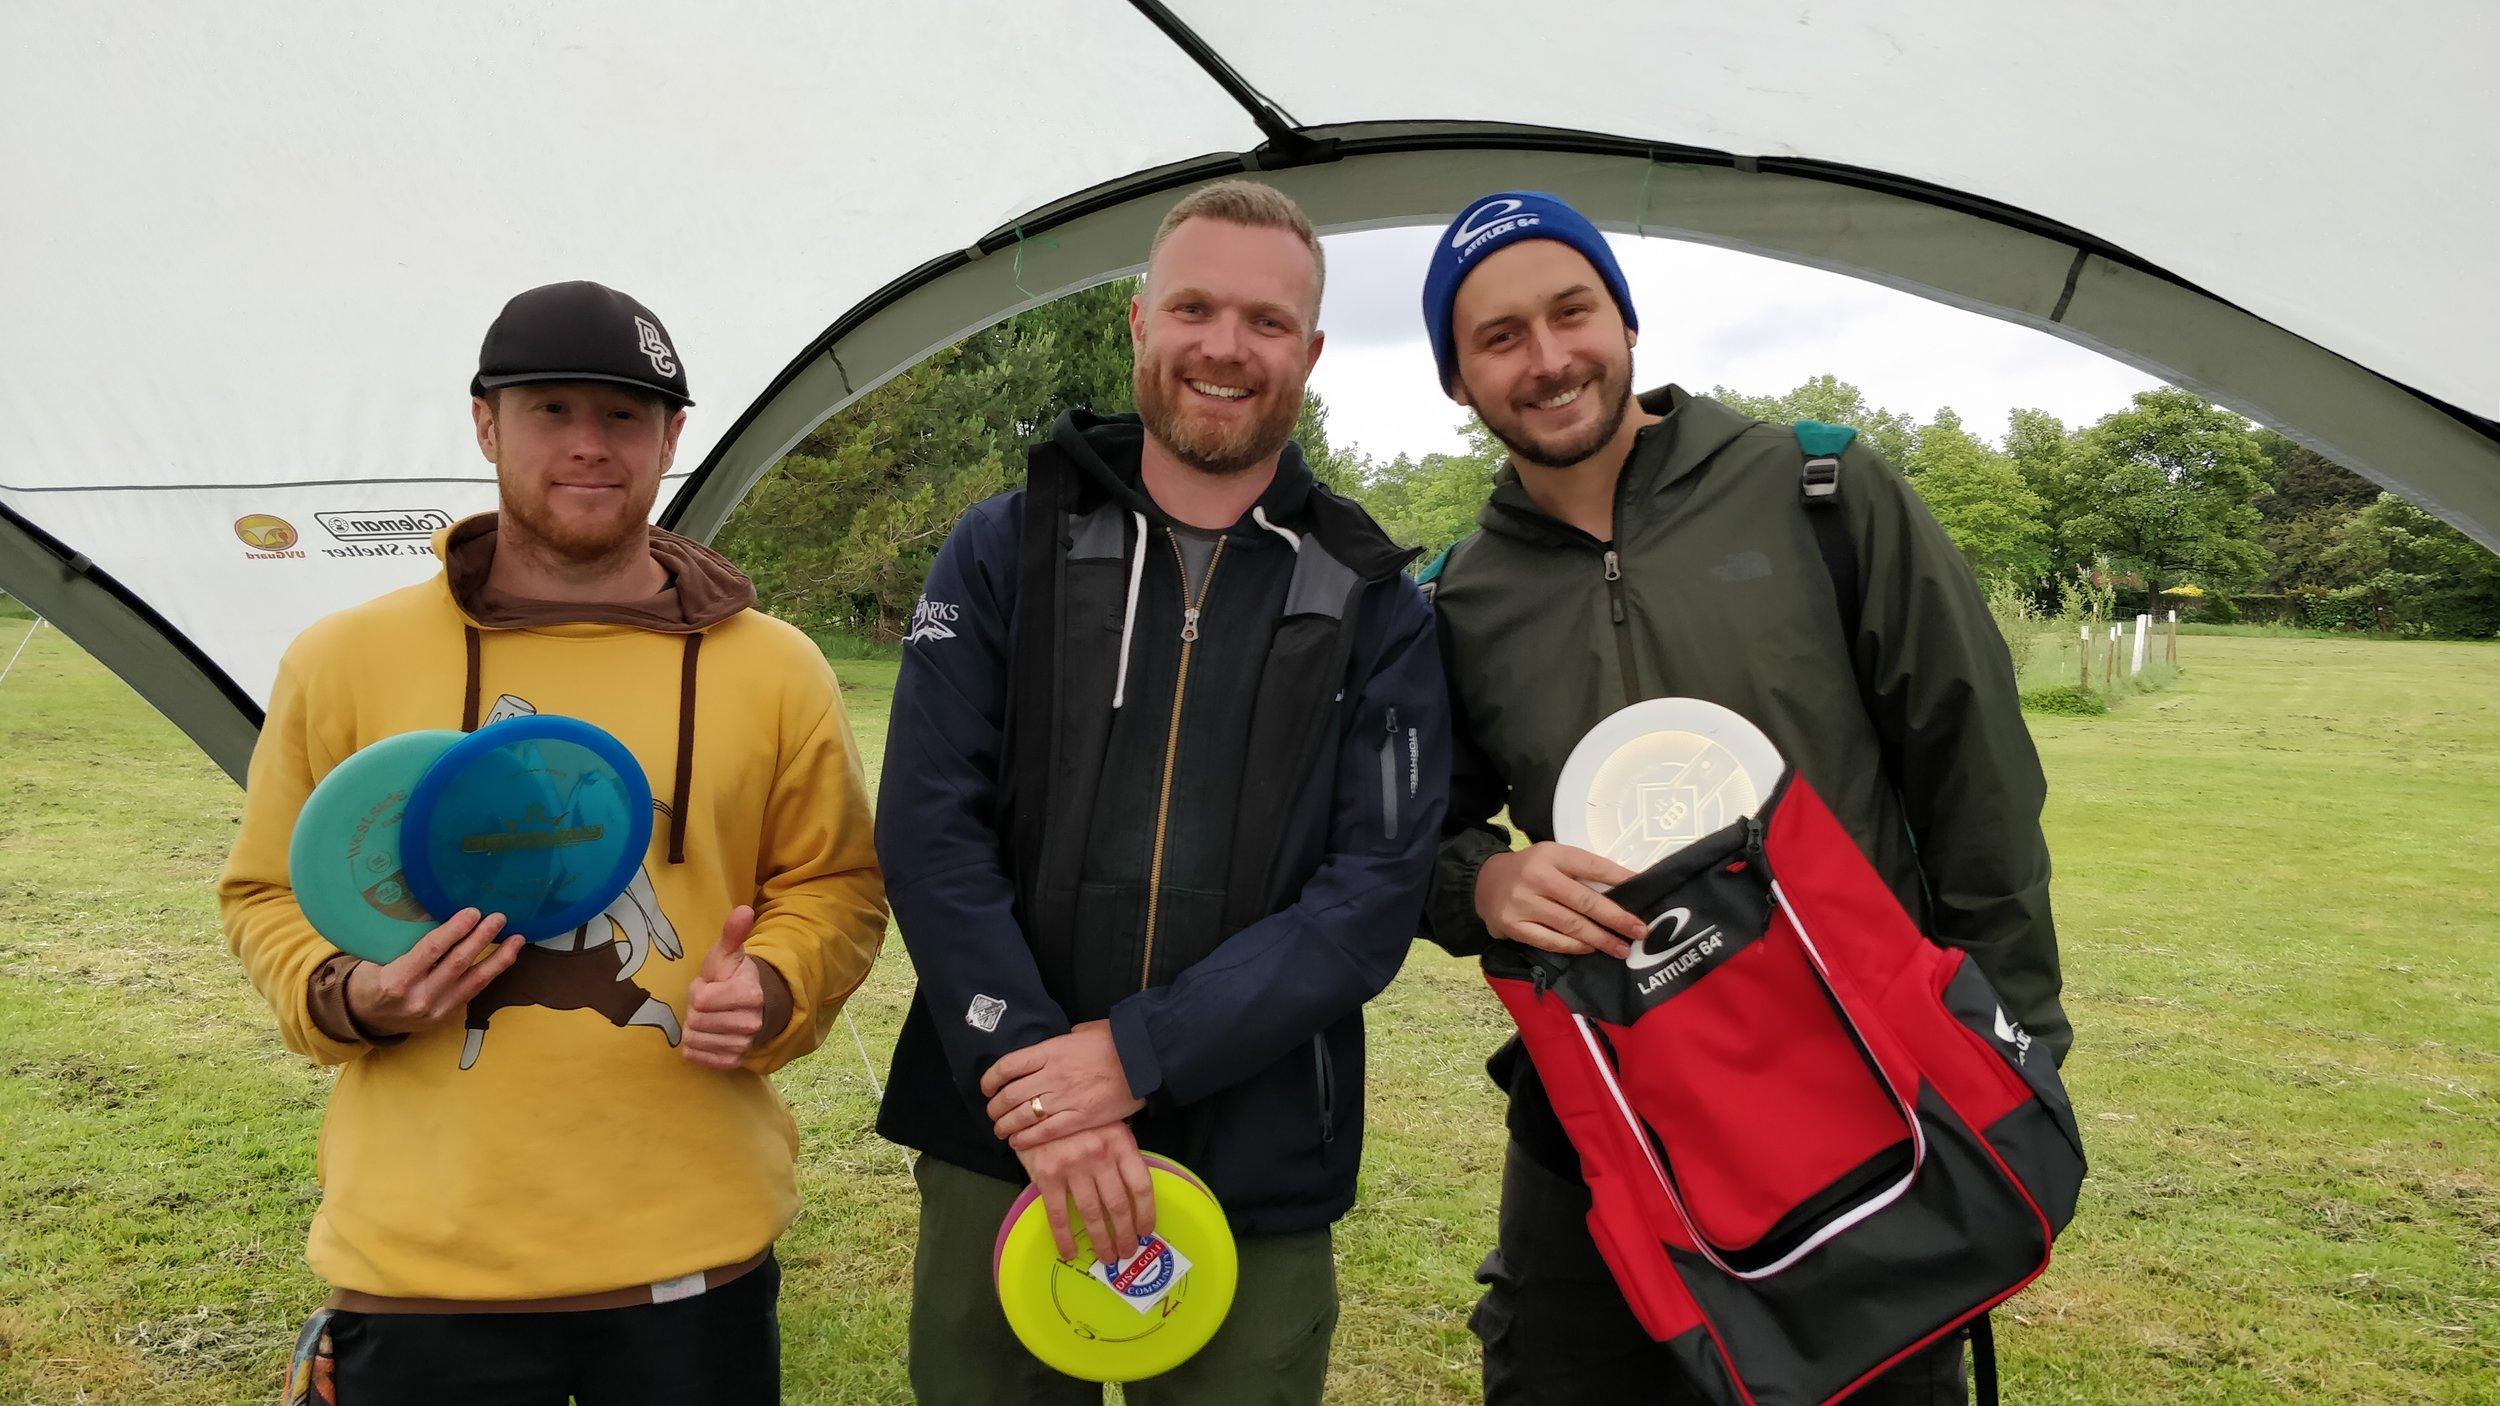 ARR: Jack Lemon, Ben Hadley & David Quigley